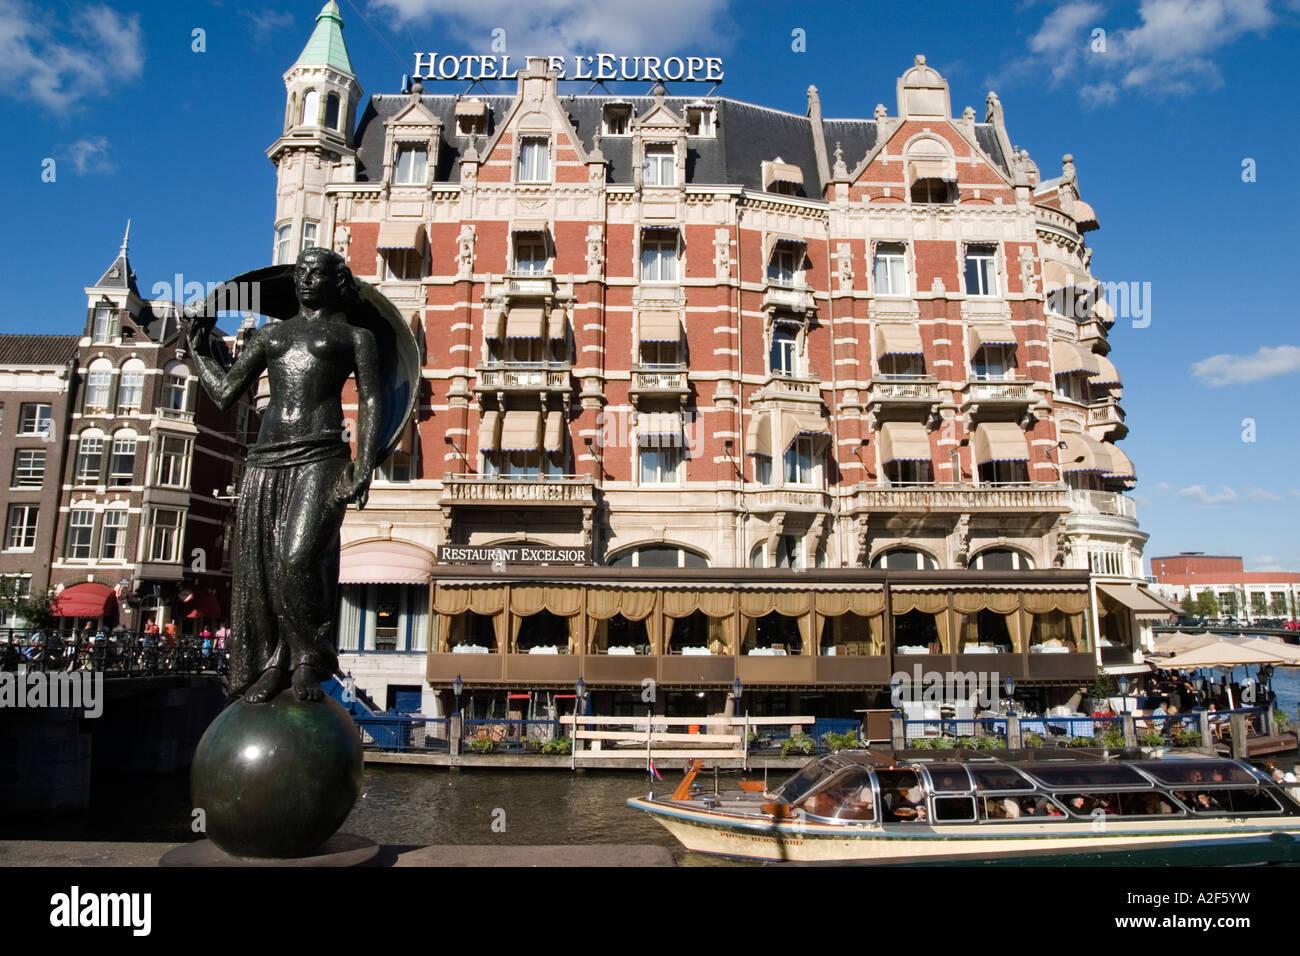 Amsterdam Hotel de l Europe canal sculpture canal boat Restaurant Exelsior Terasse - Stock Image